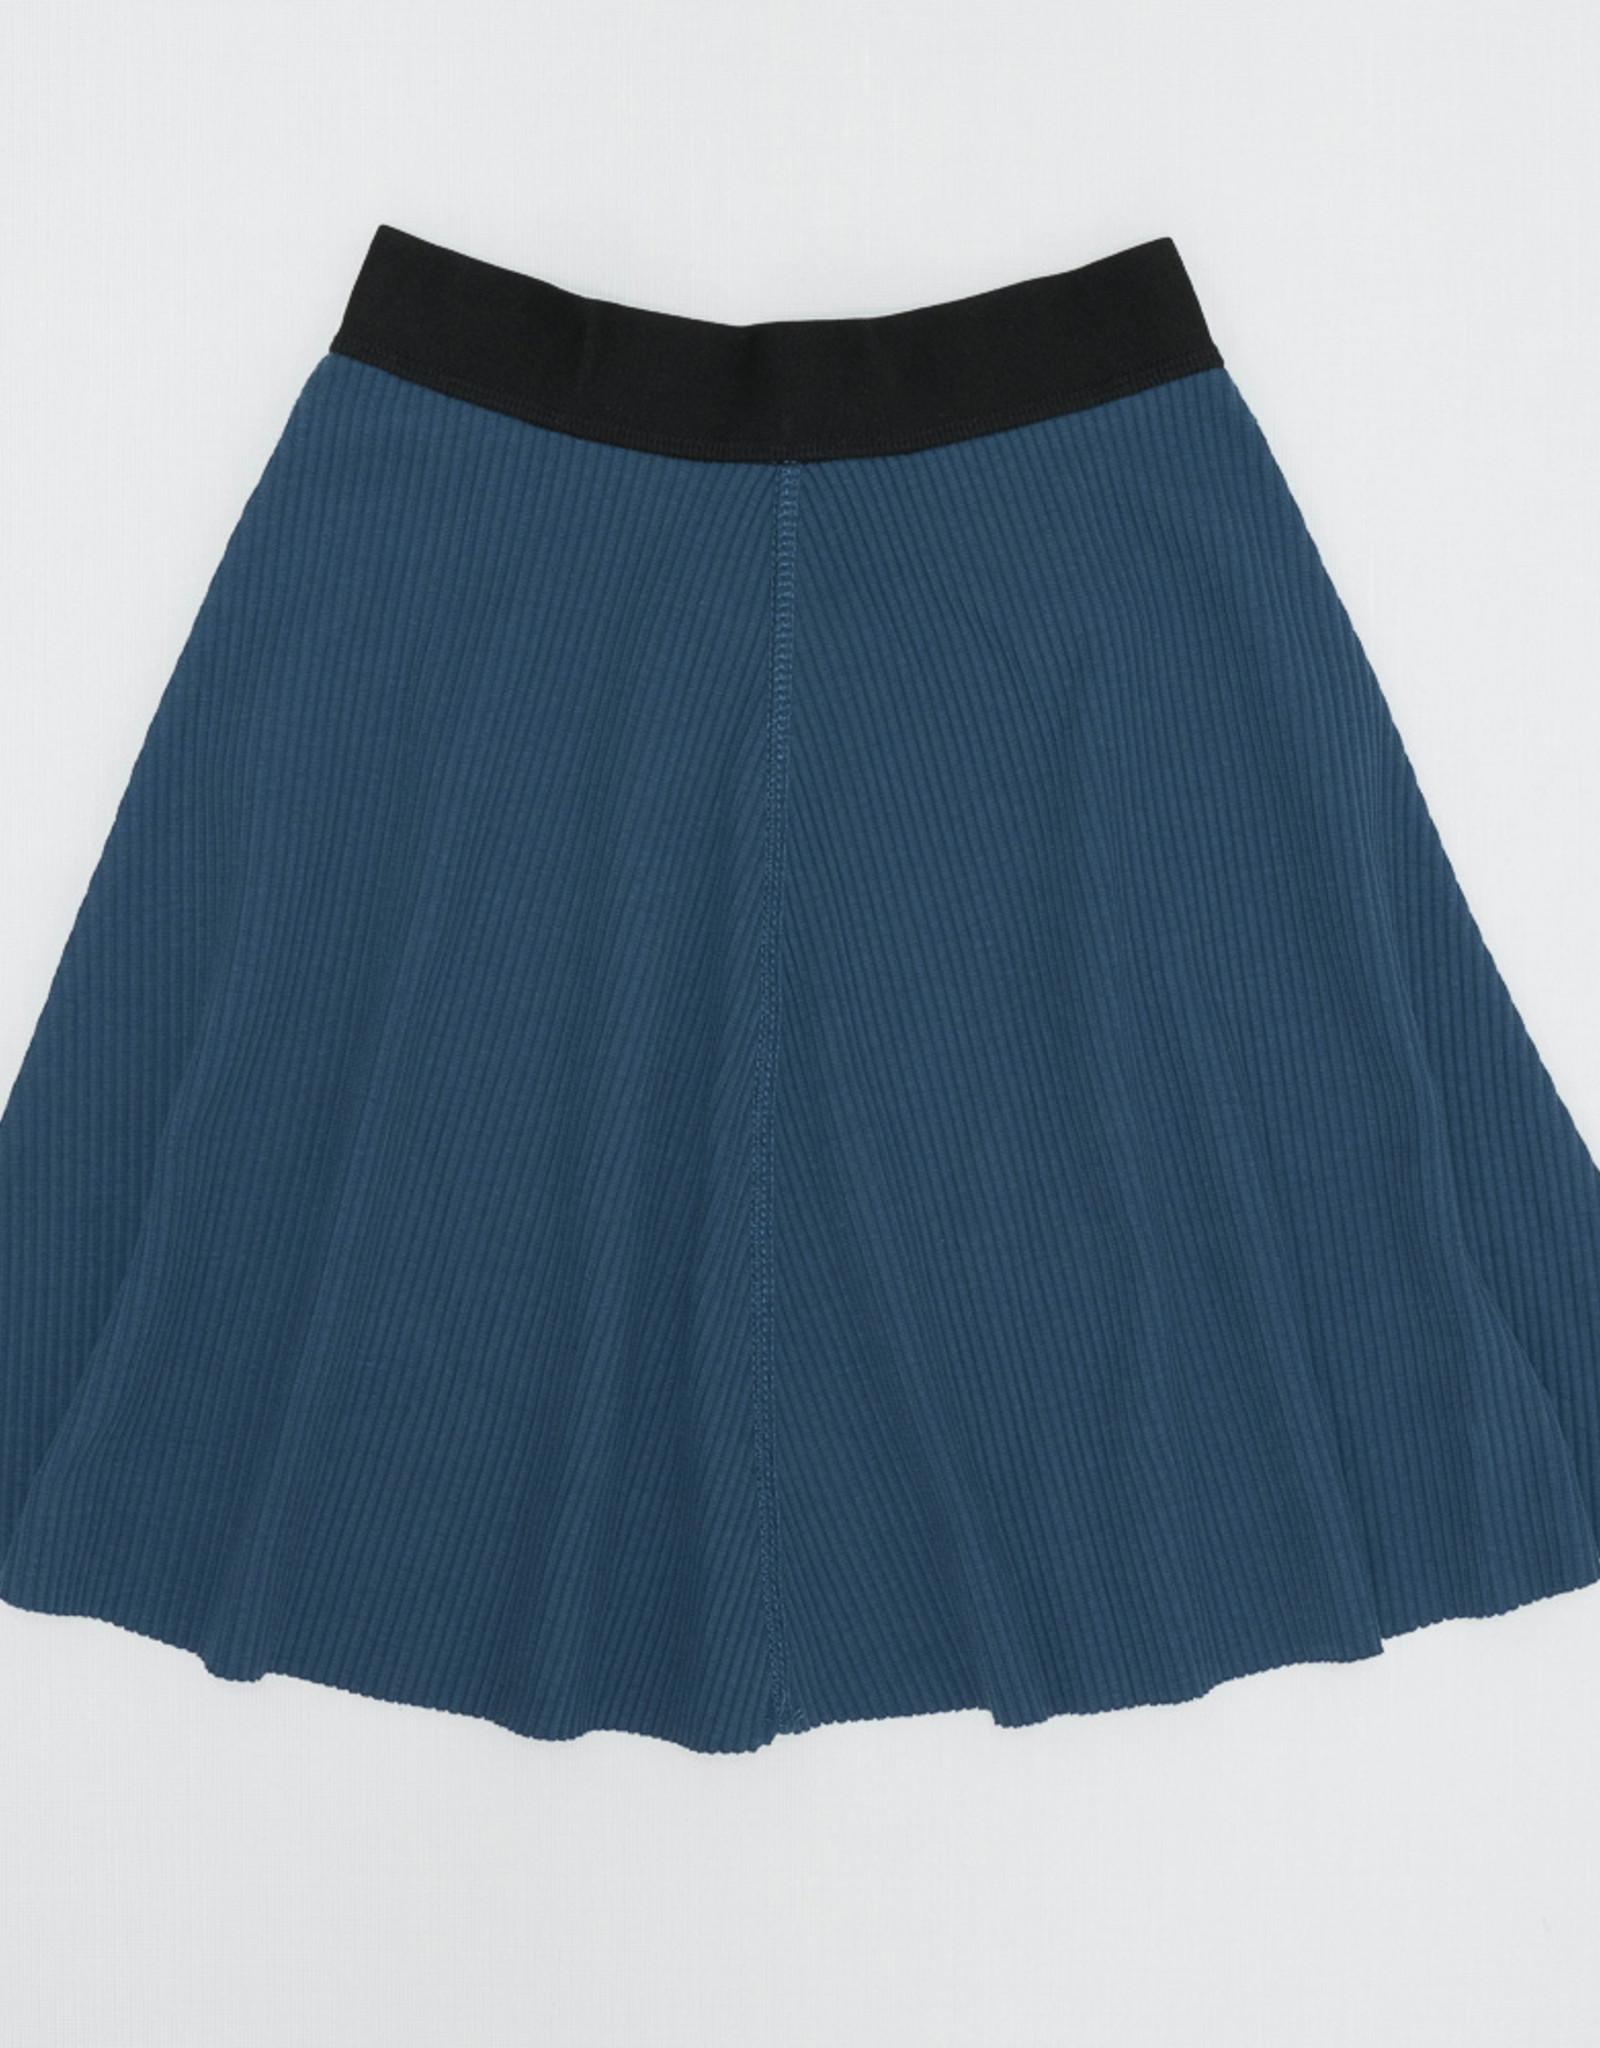 FYI Girls Flare Ribbed Skirt With Elastic Waistband